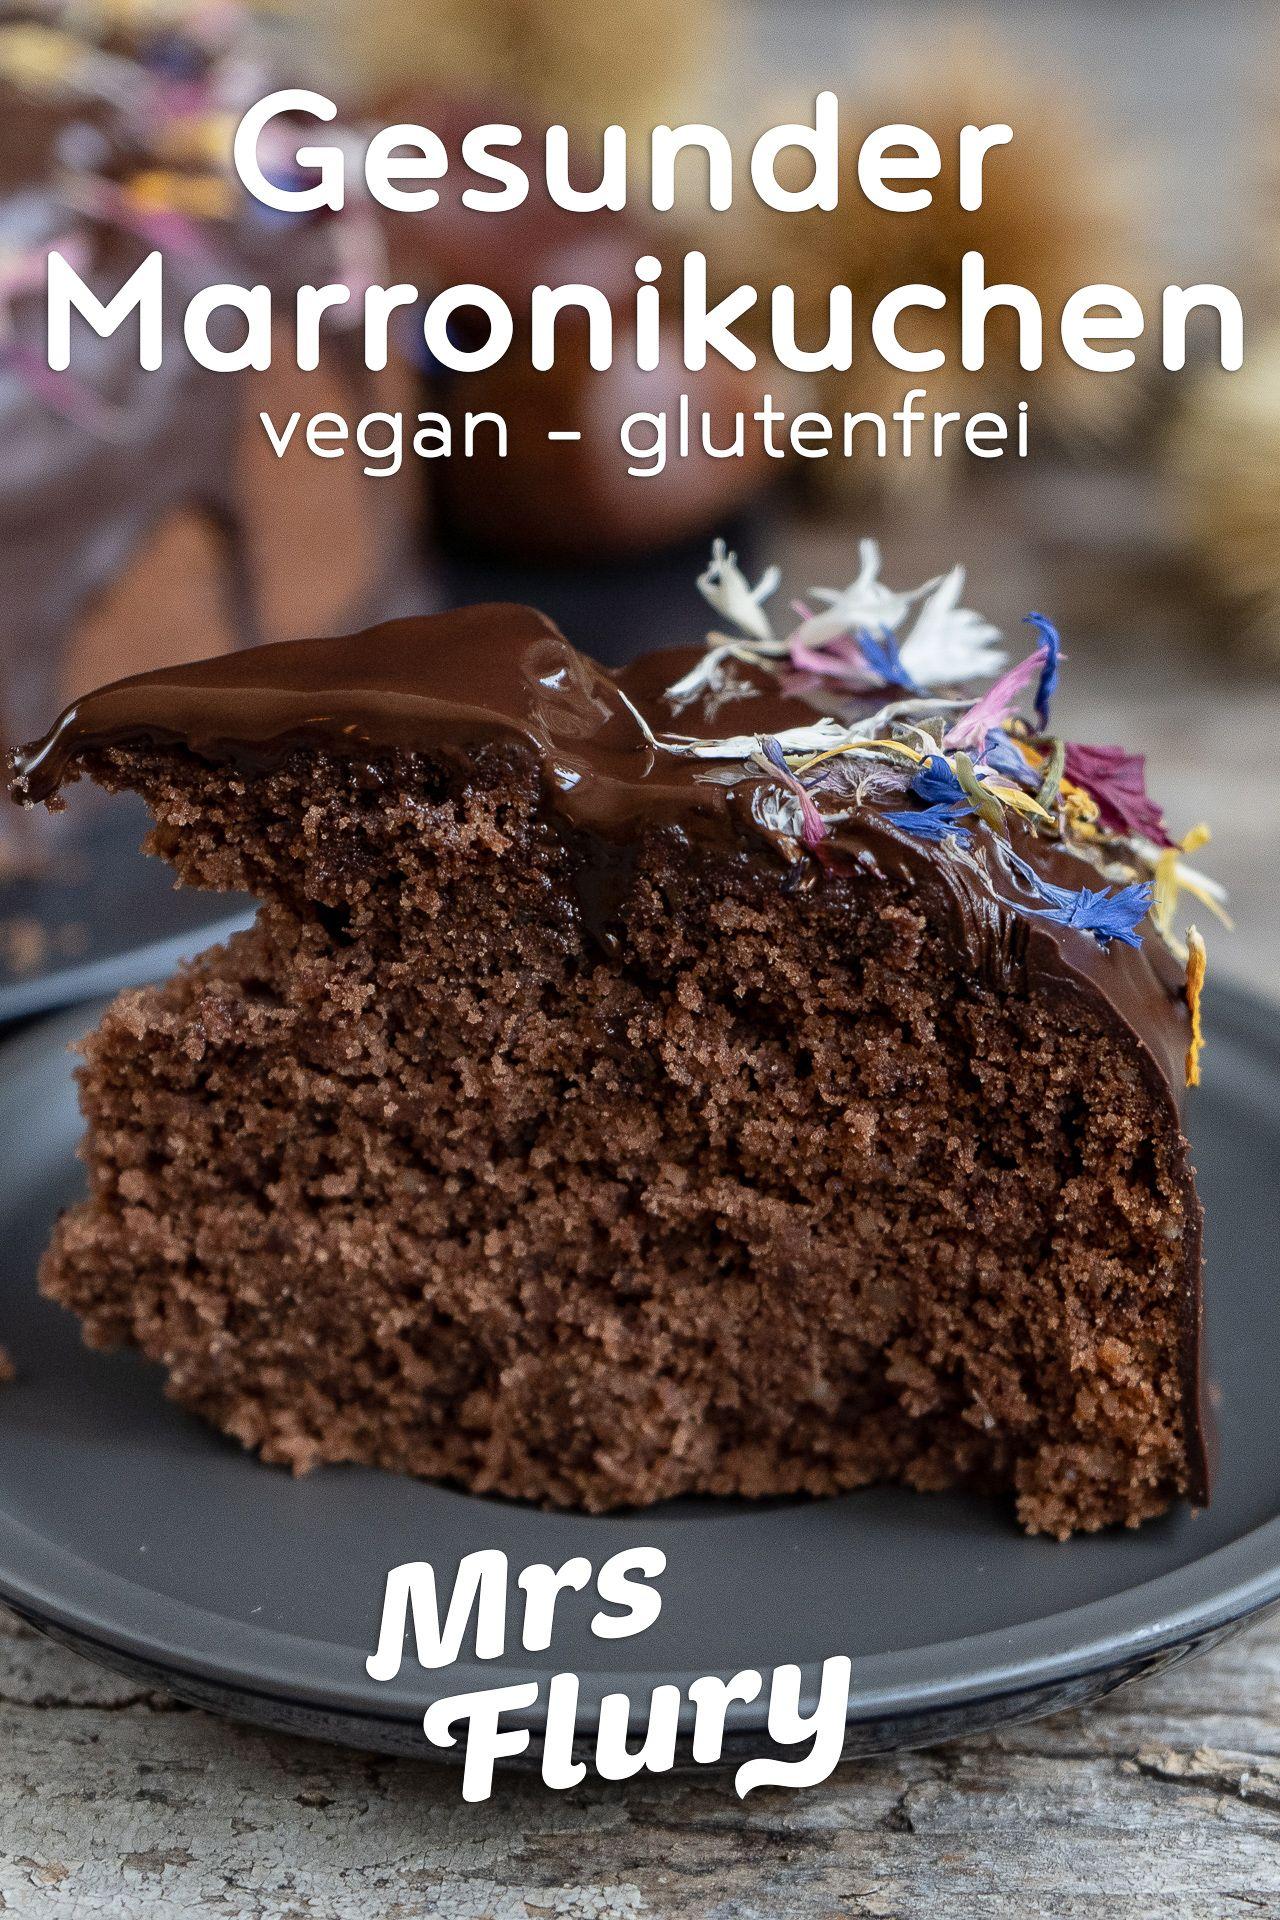 Gesunder Marronikuchen - vegan & glutenfrei - Mrs Flury